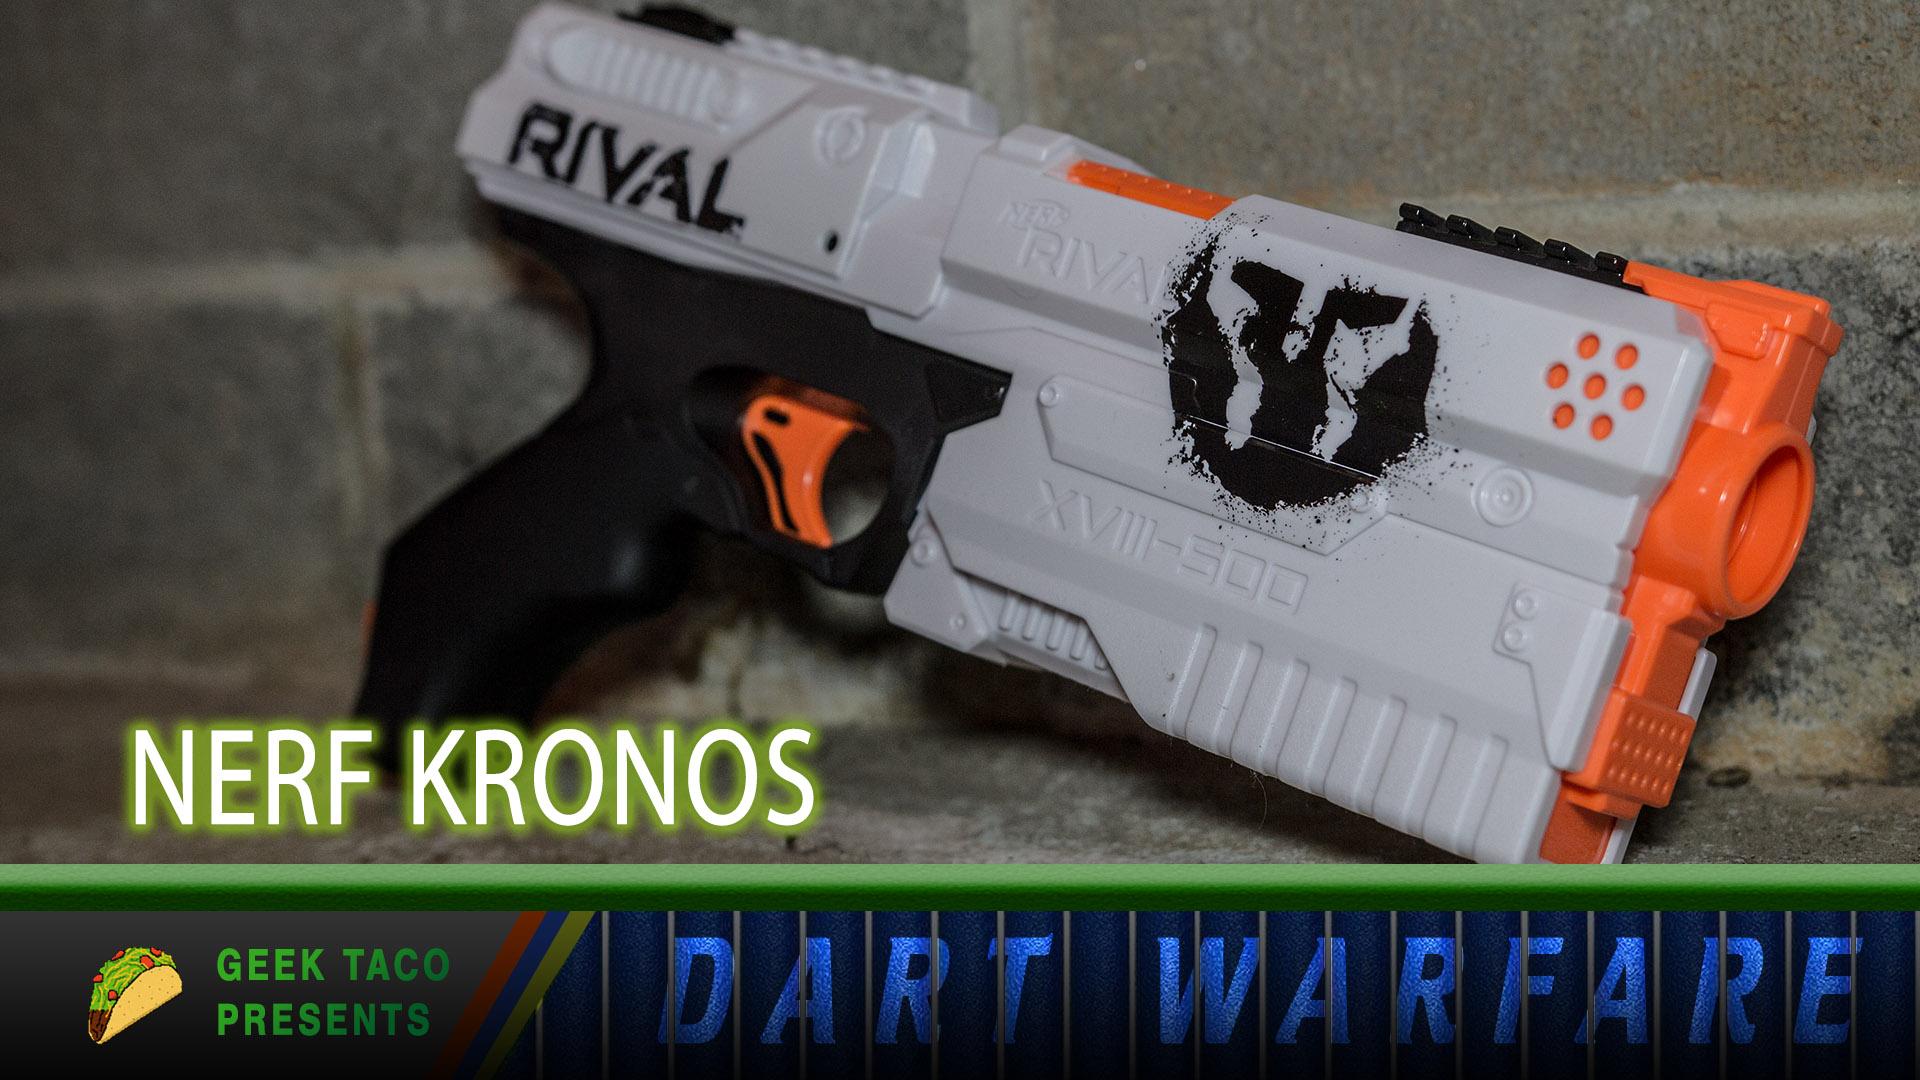 Dart Warfare: The NERF Kronos